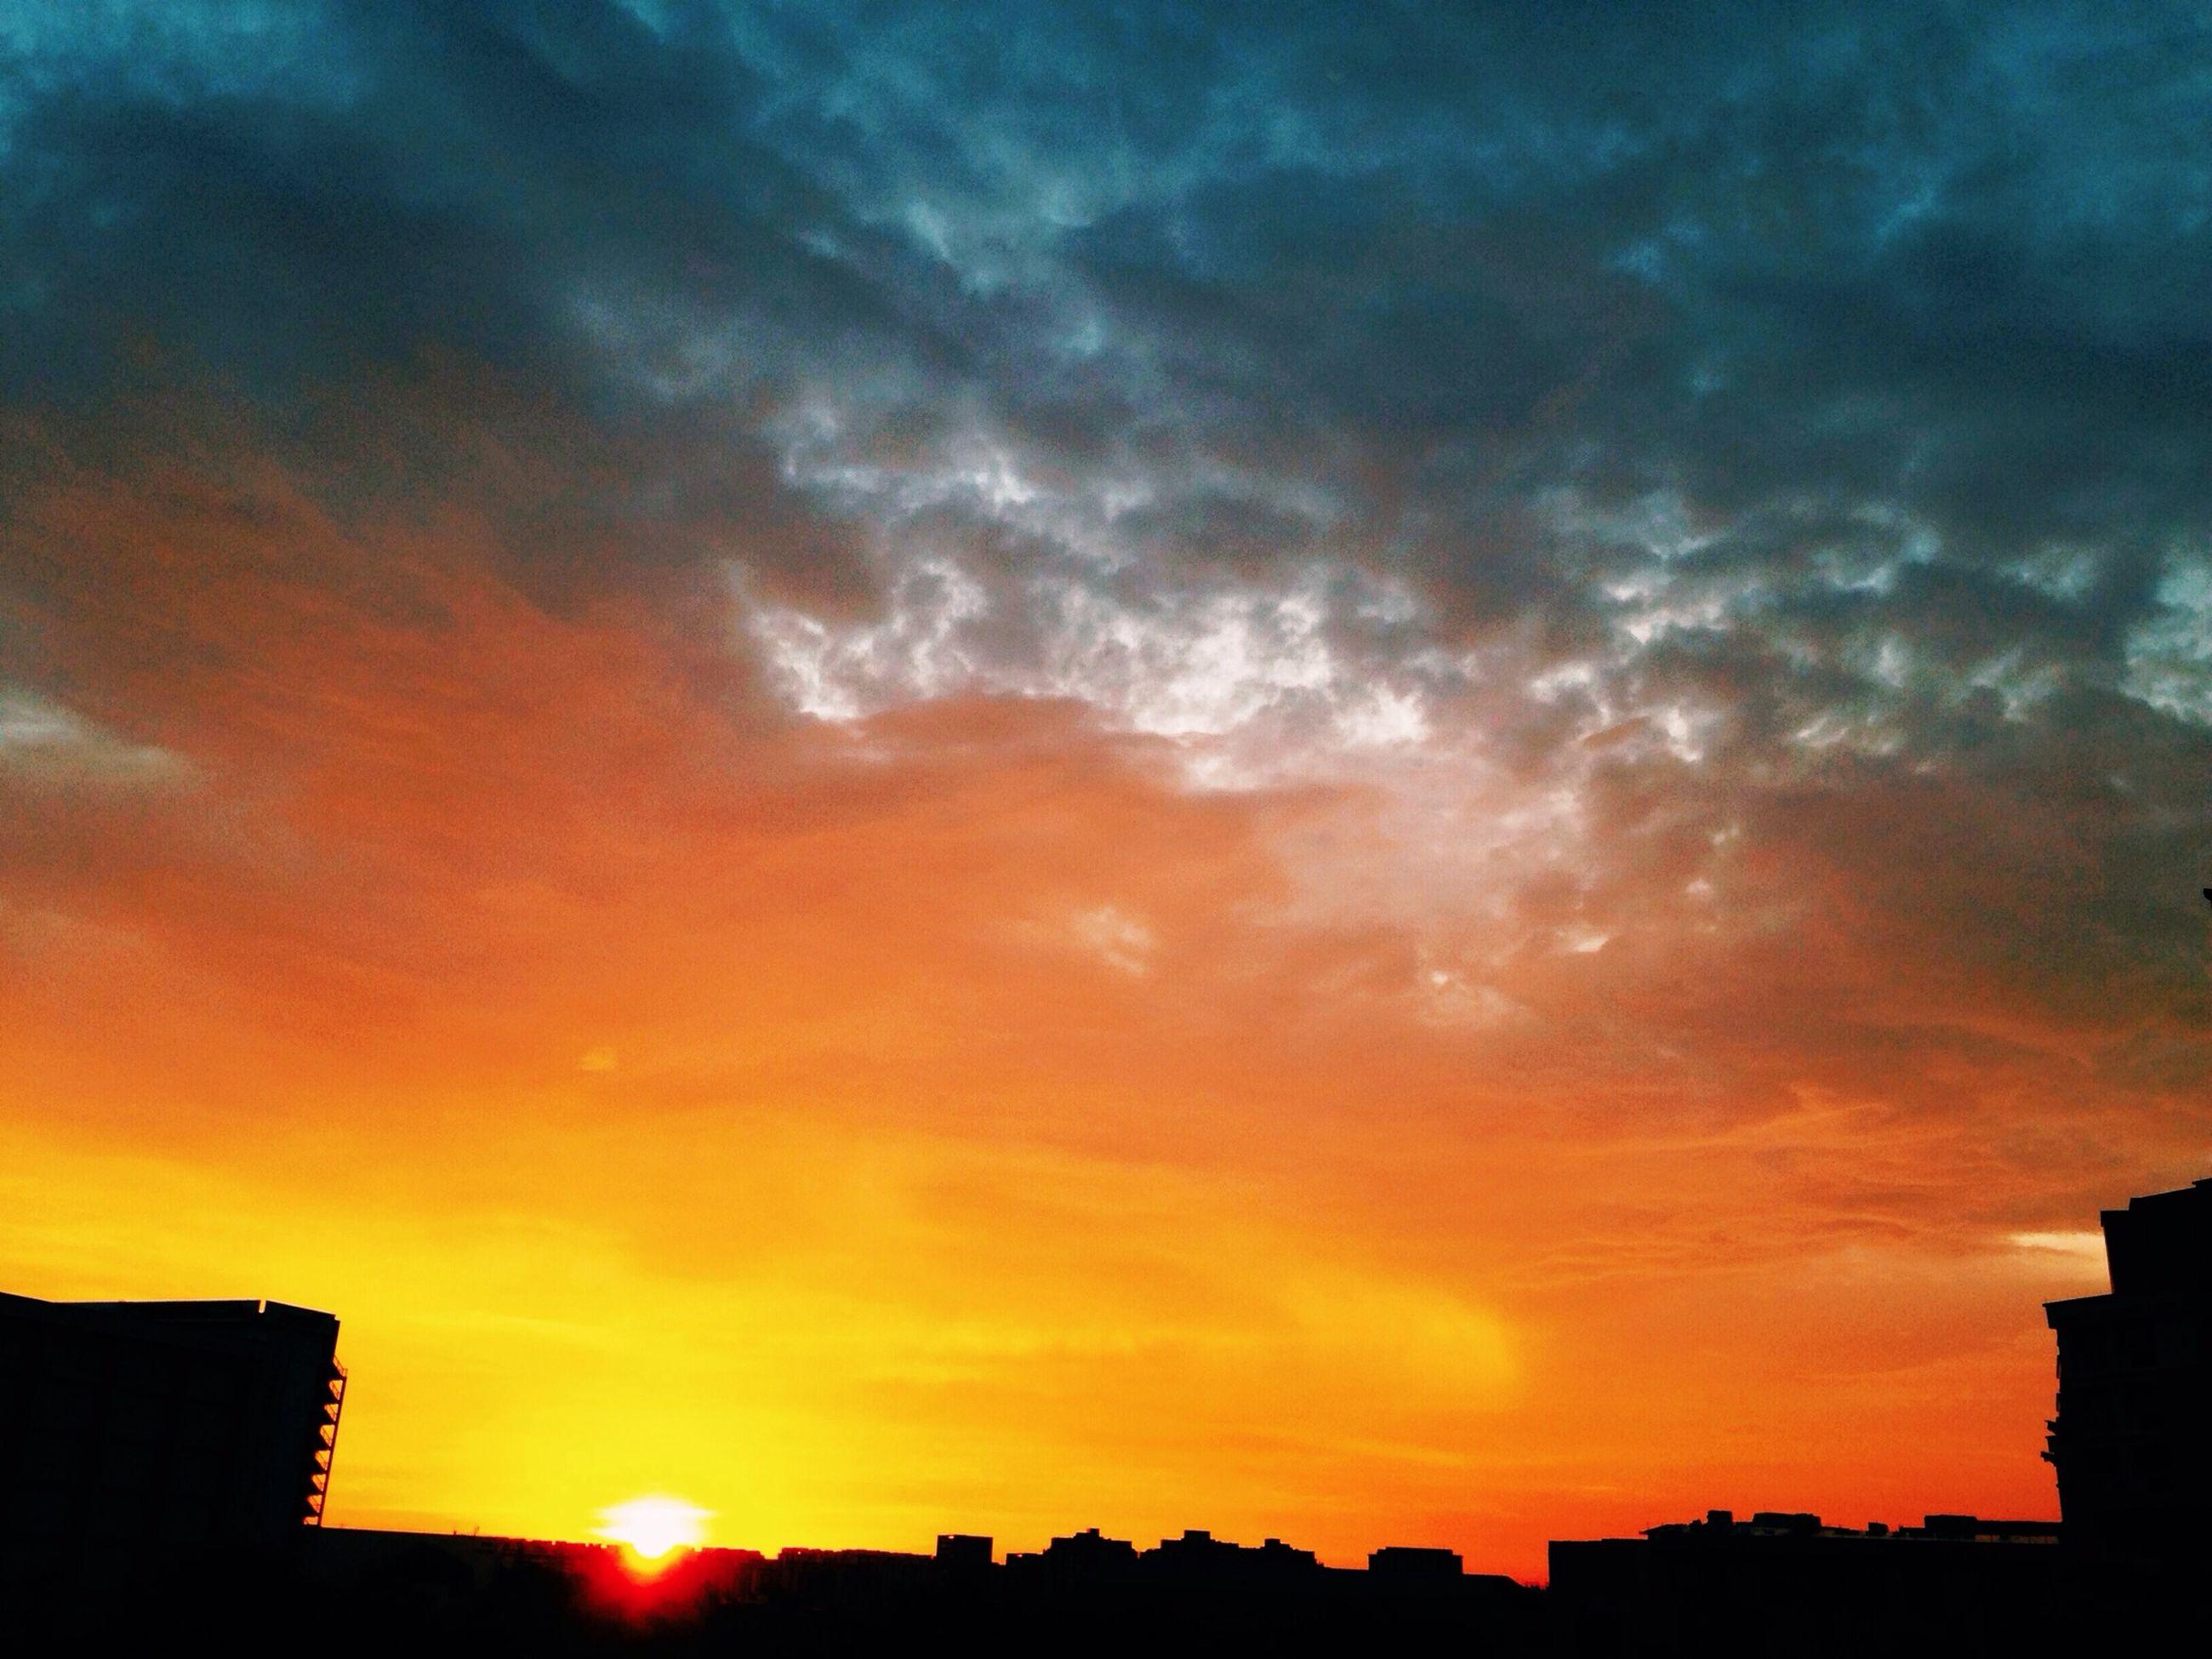 sunset, building exterior, architecture, built structure, silhouette, sky, orange color, cloud - sky, sun, low angle view, city, beauty in nature, sunlight, building, cloud, dramatic sky, cloudy, nature, residential building, scenics